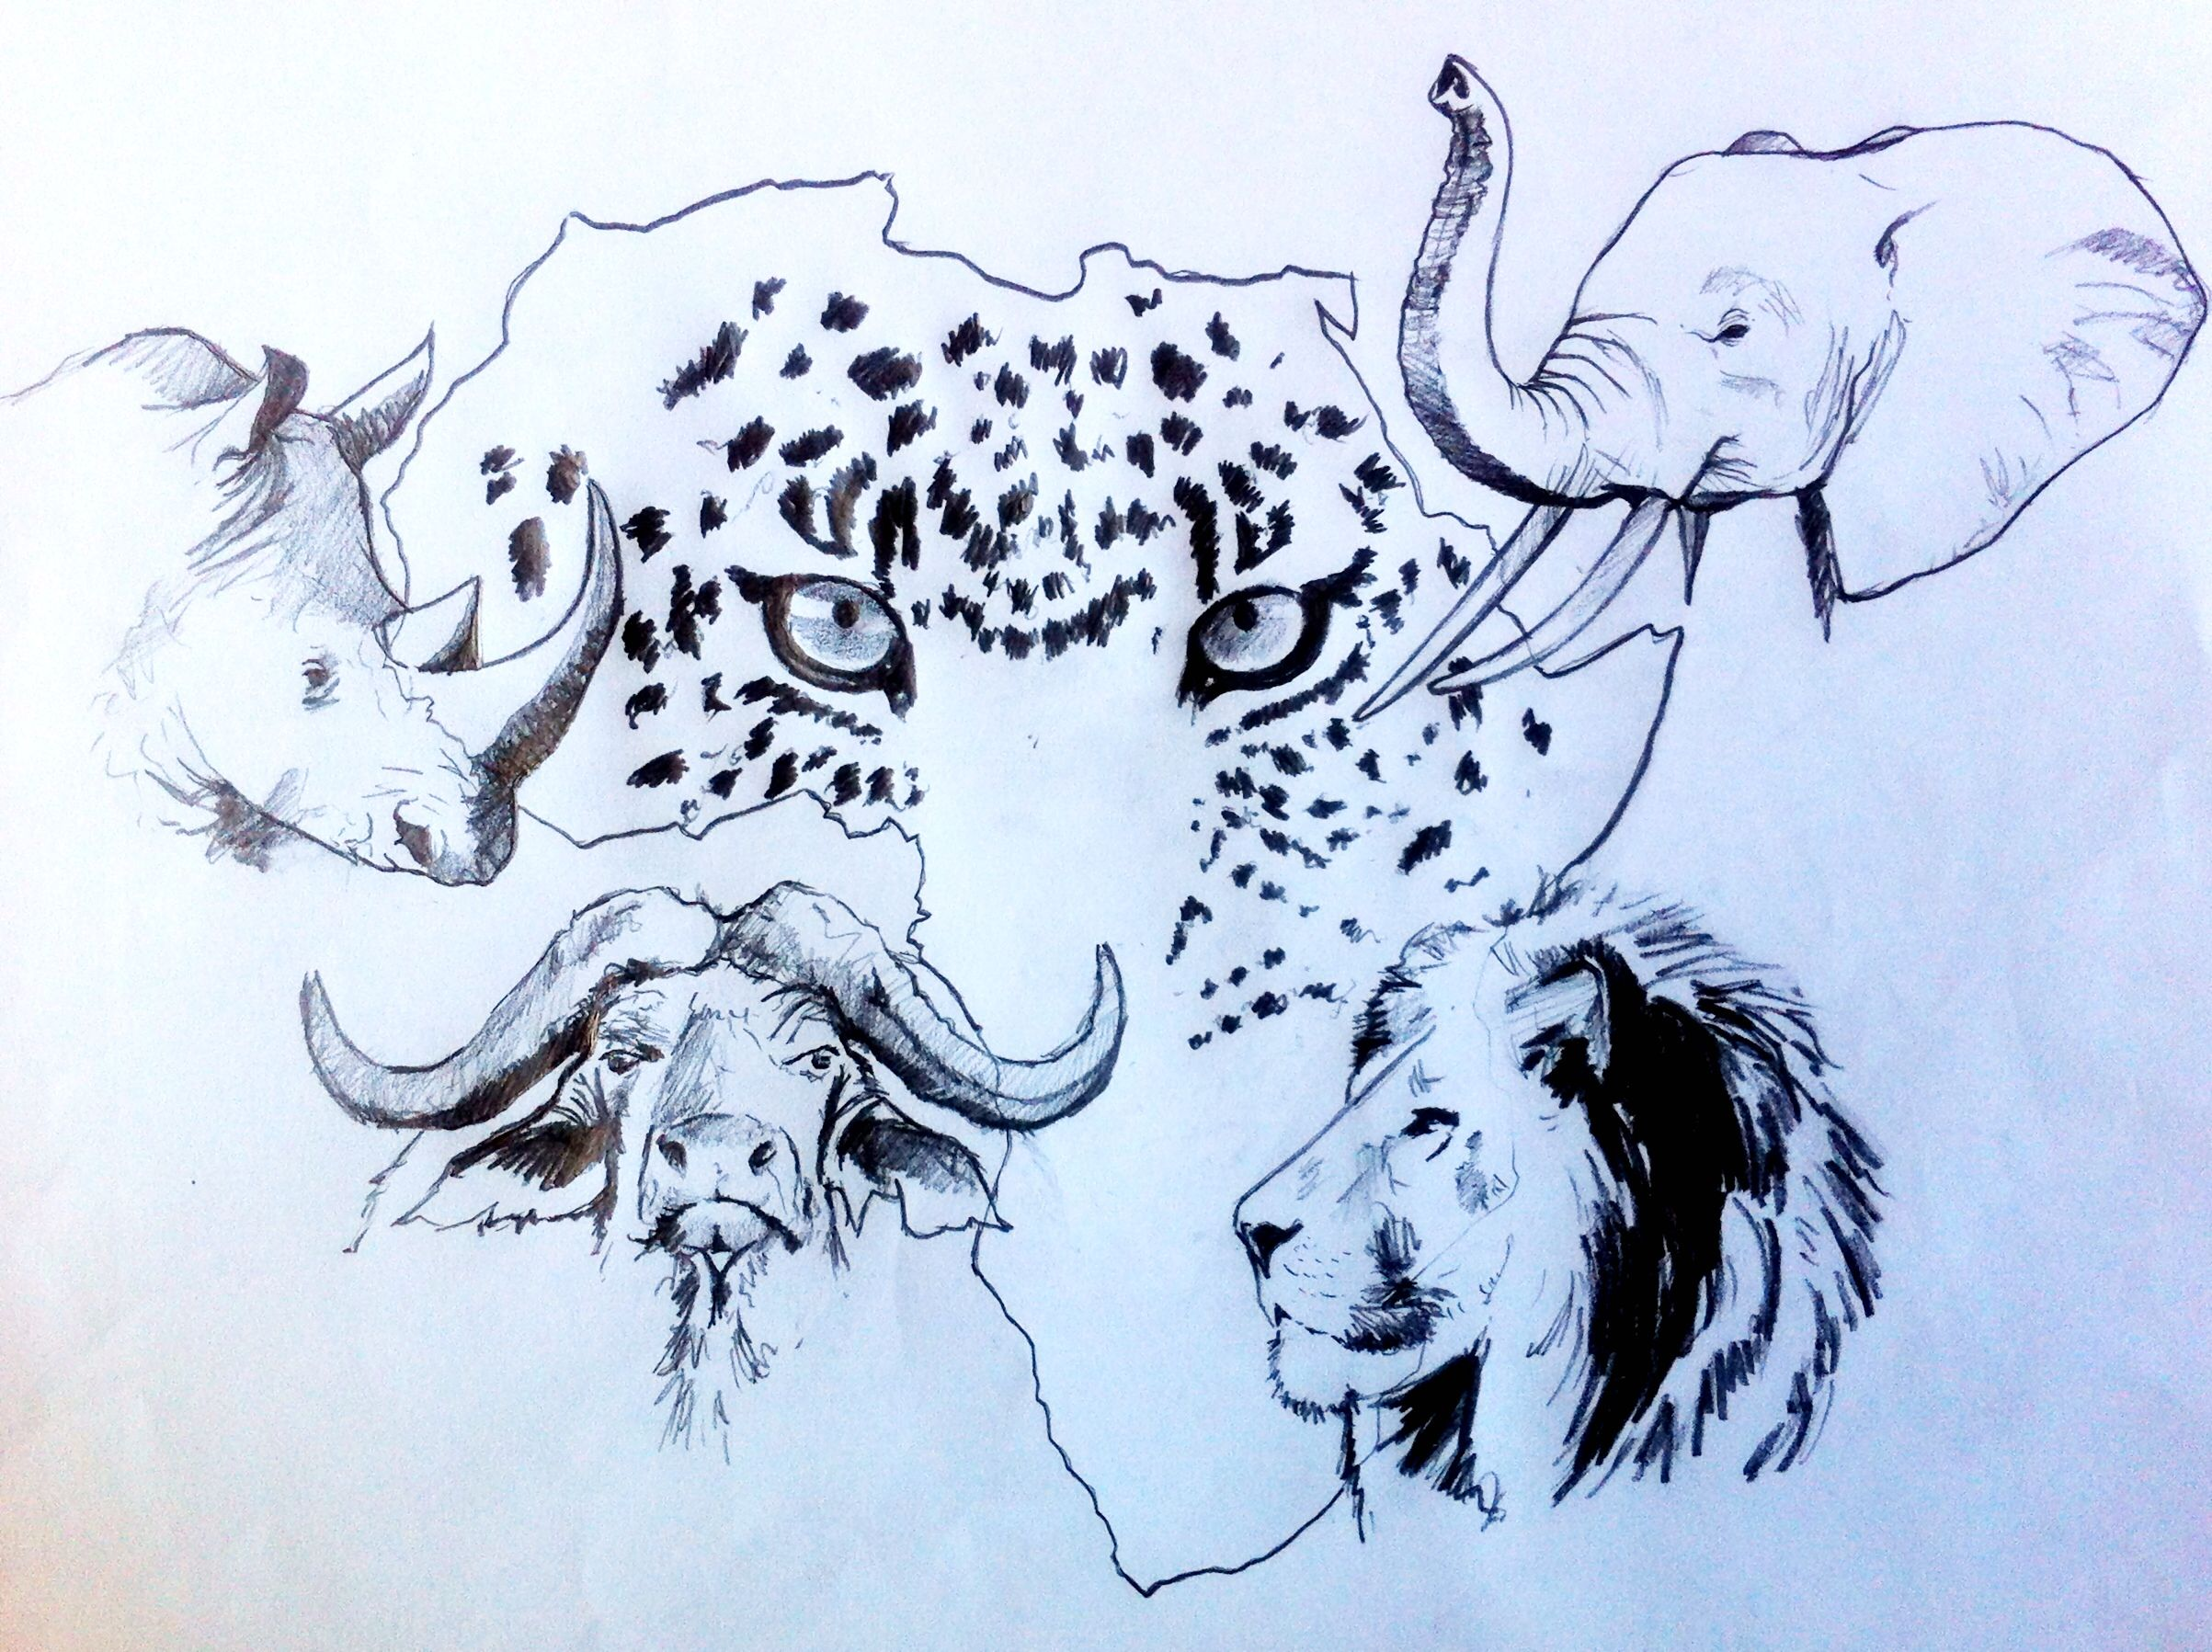 Pin By Debbie Visagie On Big 5 Art Animals Animal